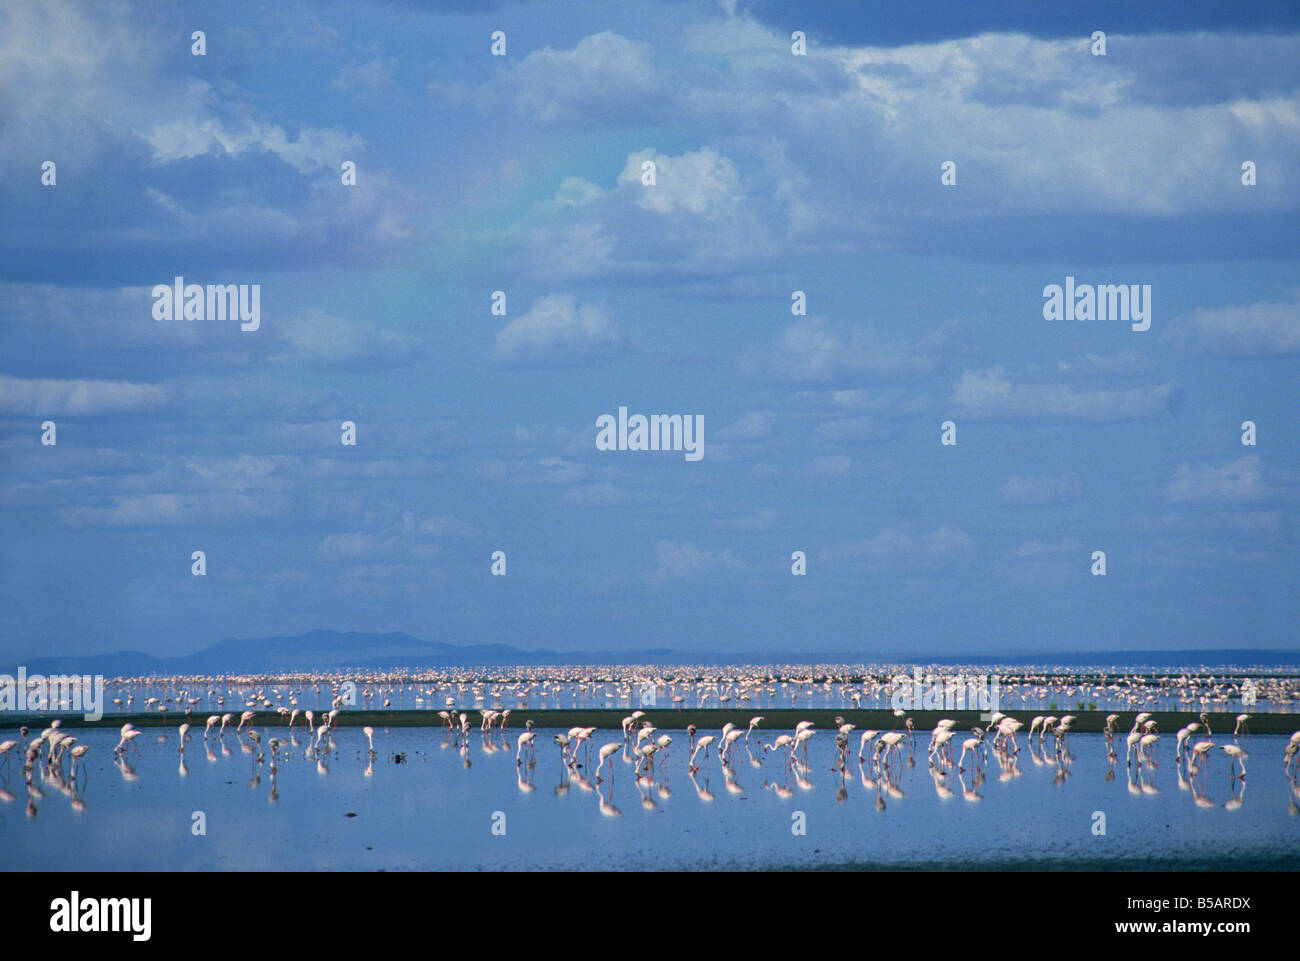 Lake Natron, Eastern Rift Valley, Tanzania, East Africa, Africa Stock Photo